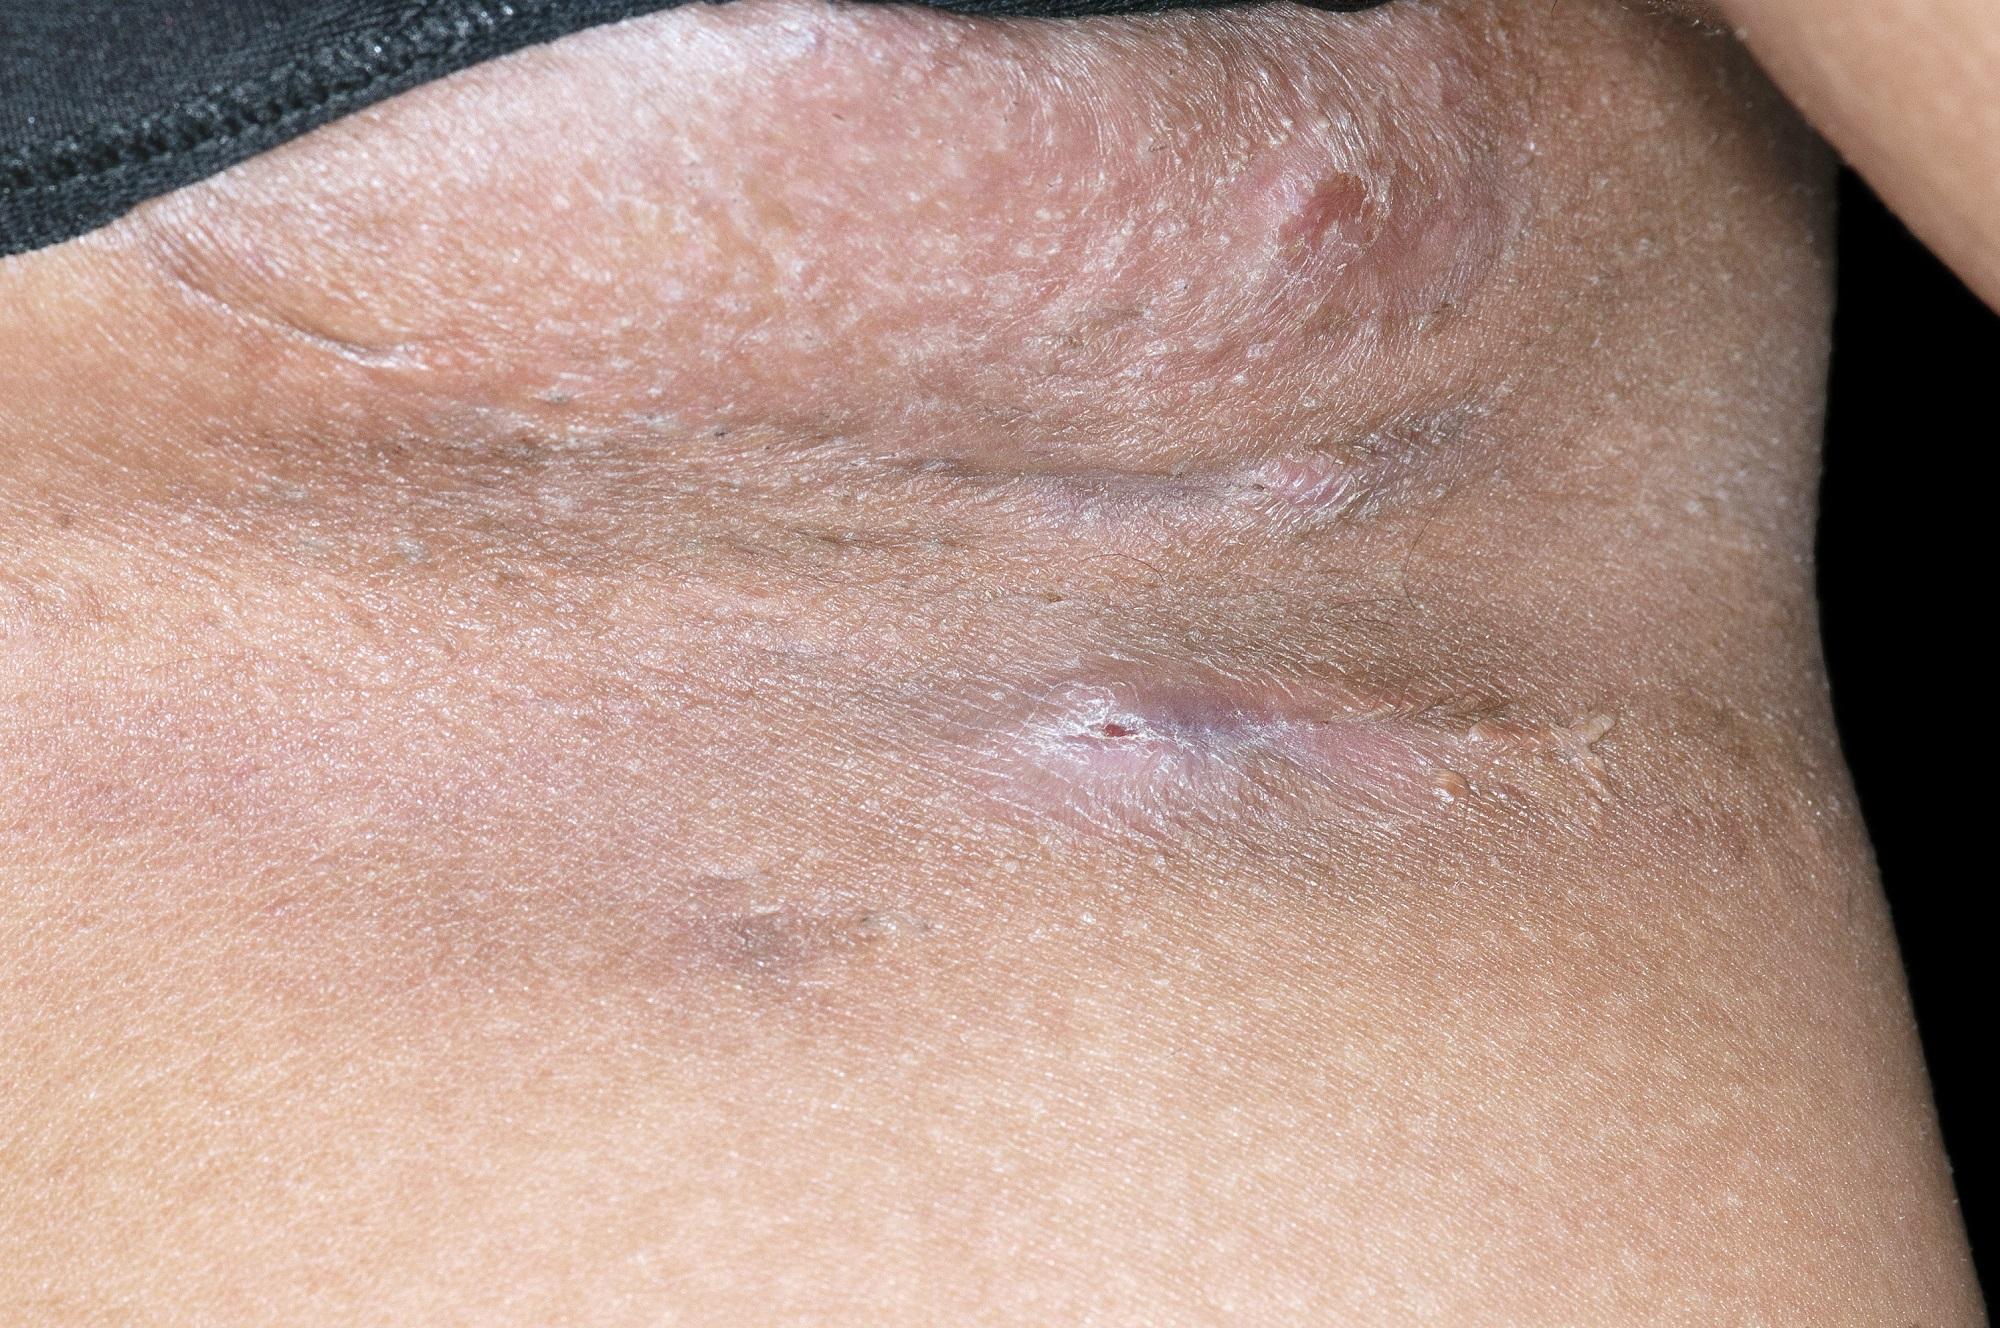 How I Treat Hidradenitis Suppurativa Dermatology Advisor